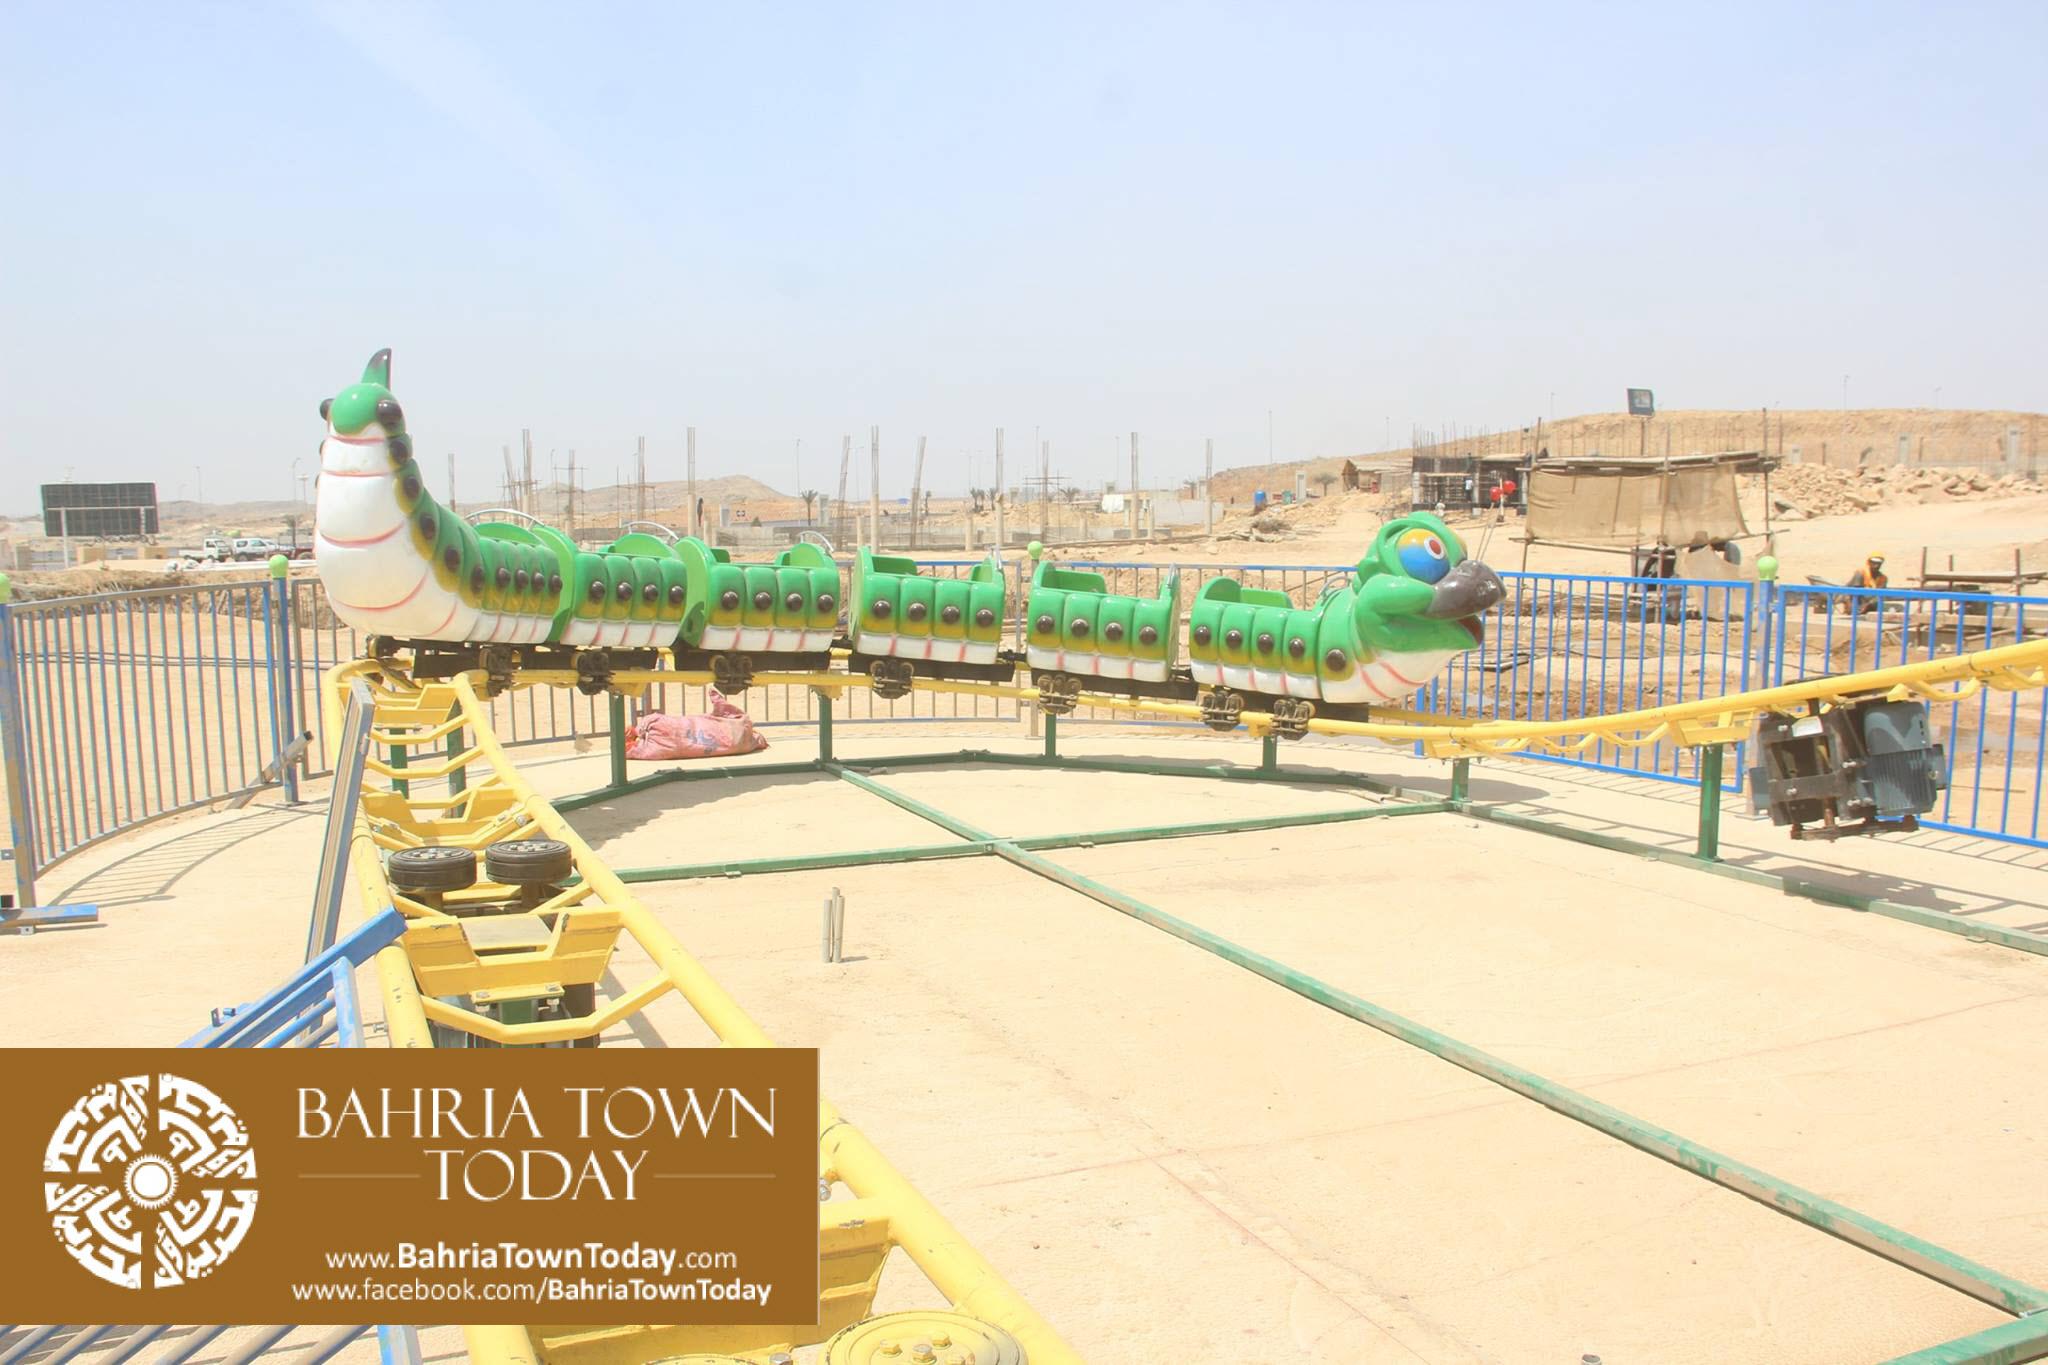 Bahria Adventura Theme Park Karachi Latest Progress Update – April 2016 (15)